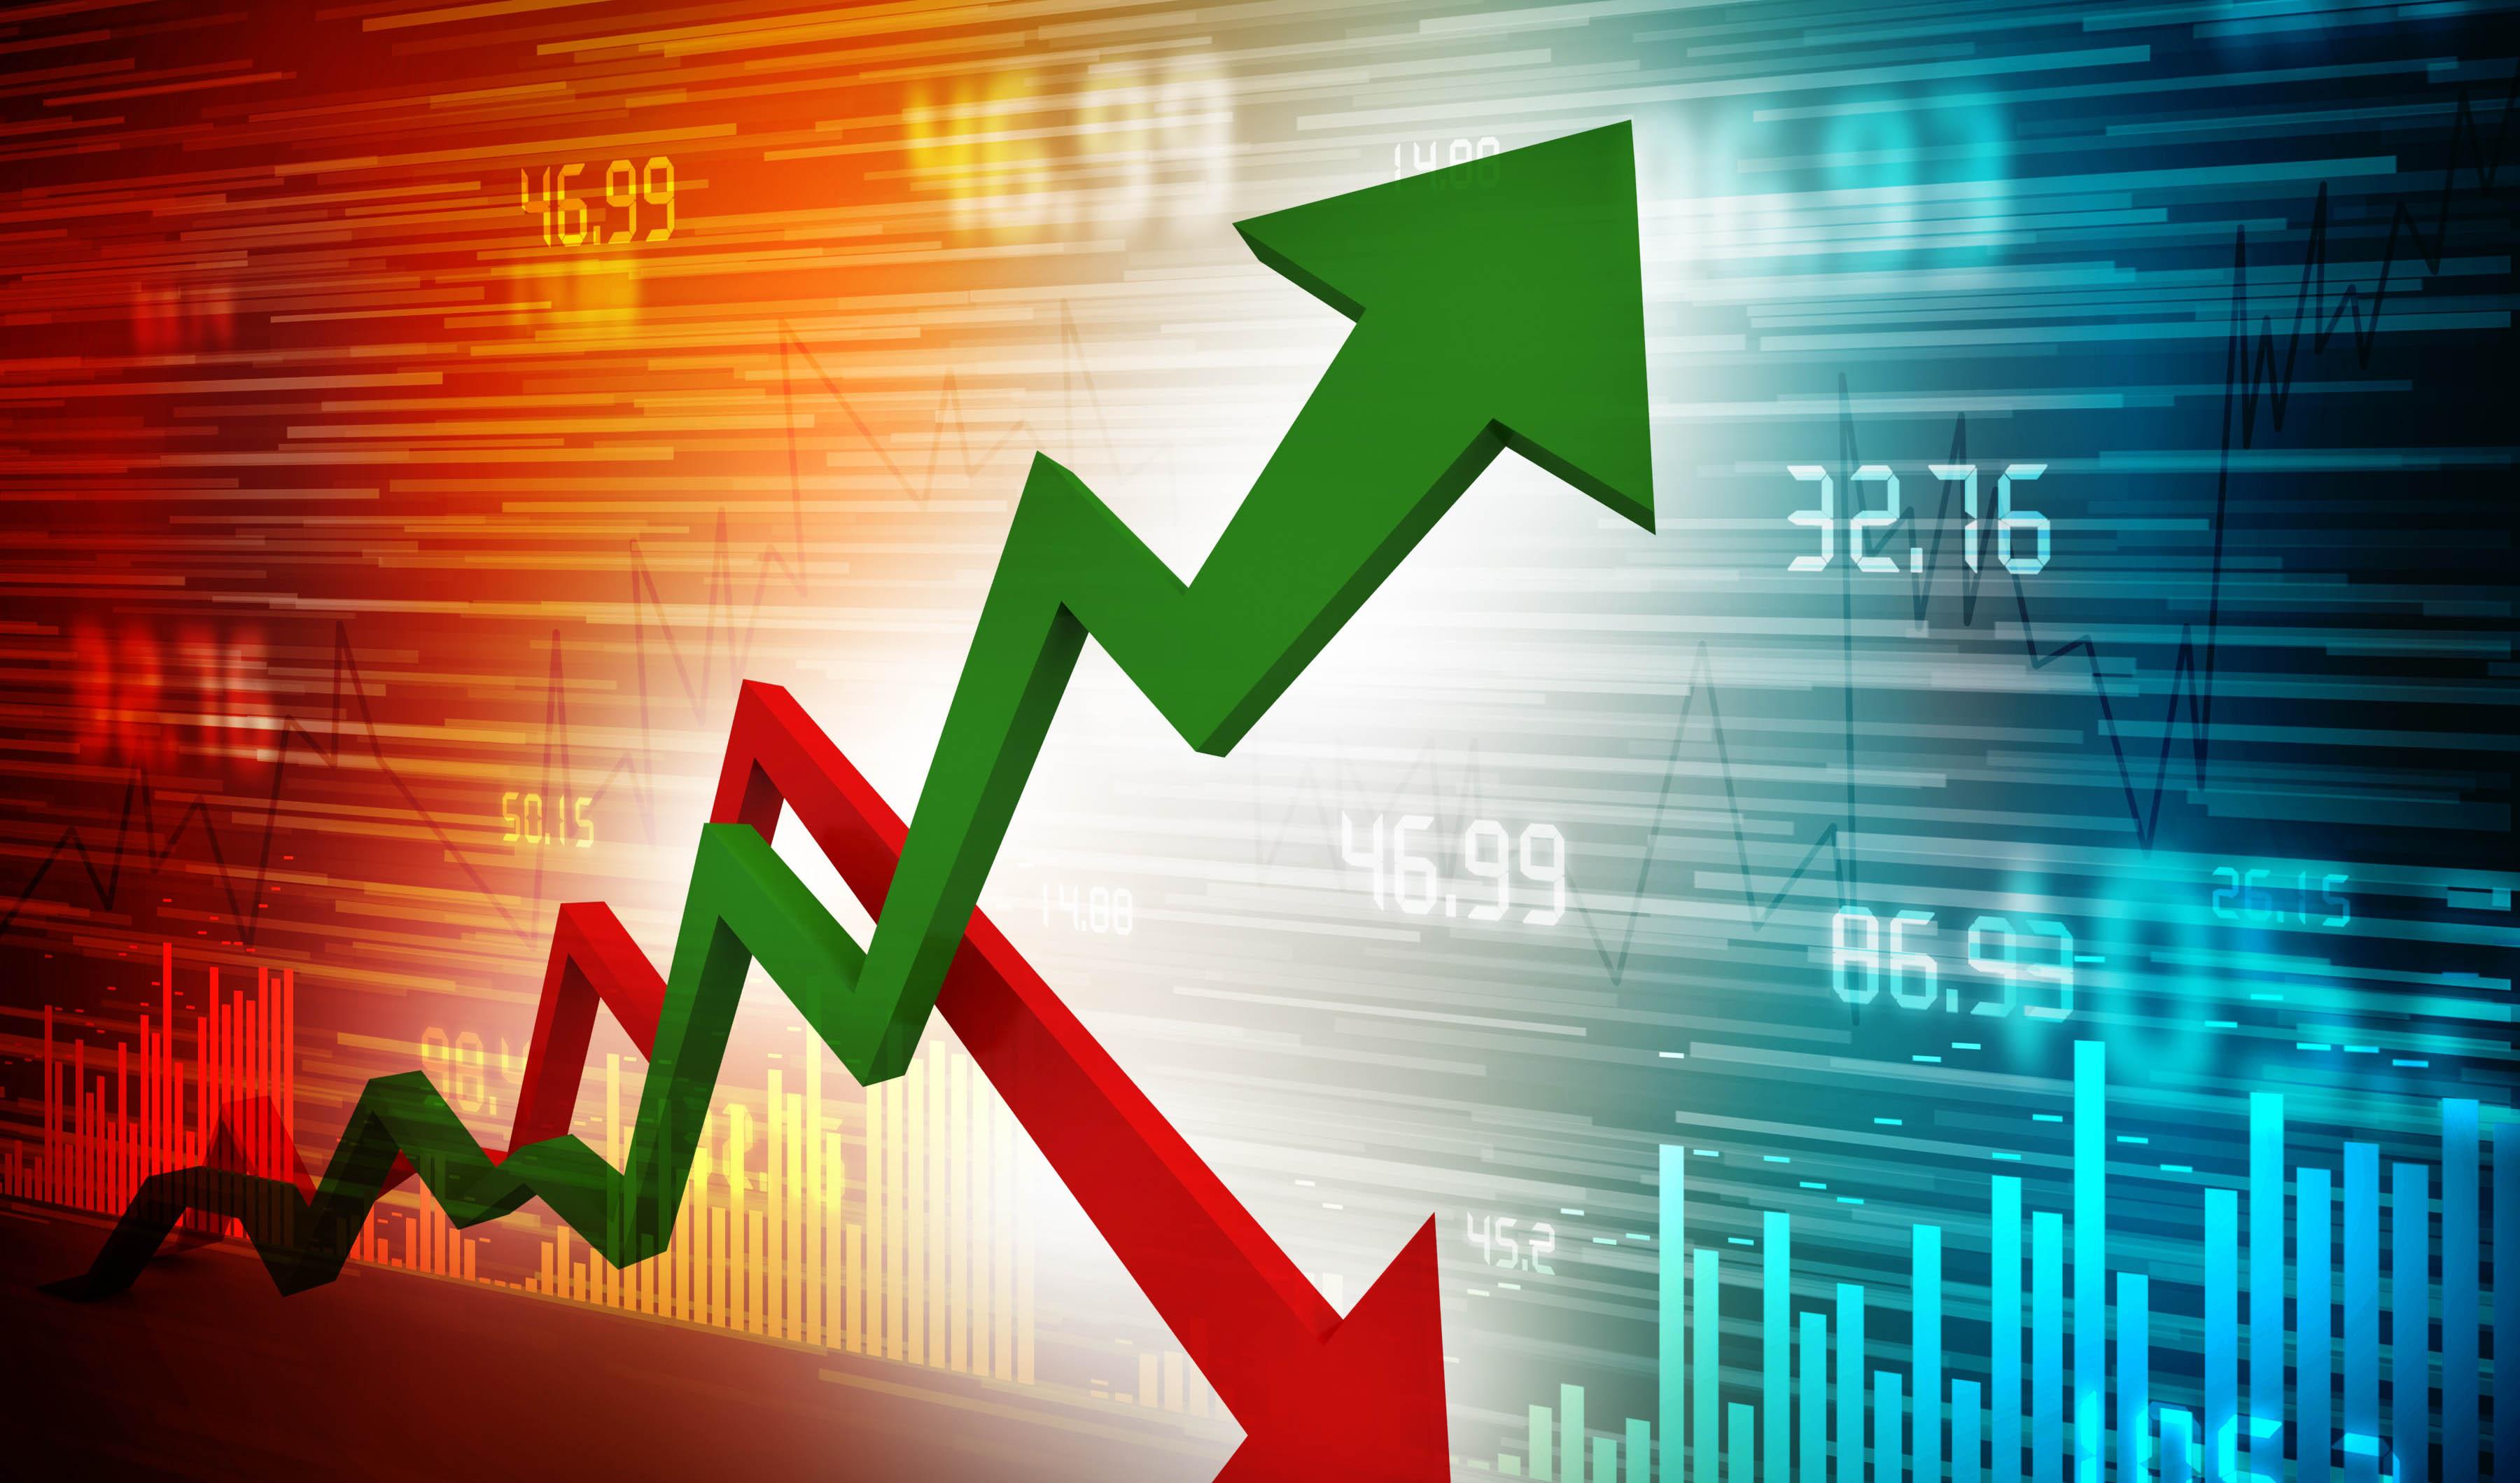 مقدمات کاهش نرخ تورم/ از تثبیت نرخ ارز تا منع خلق پول